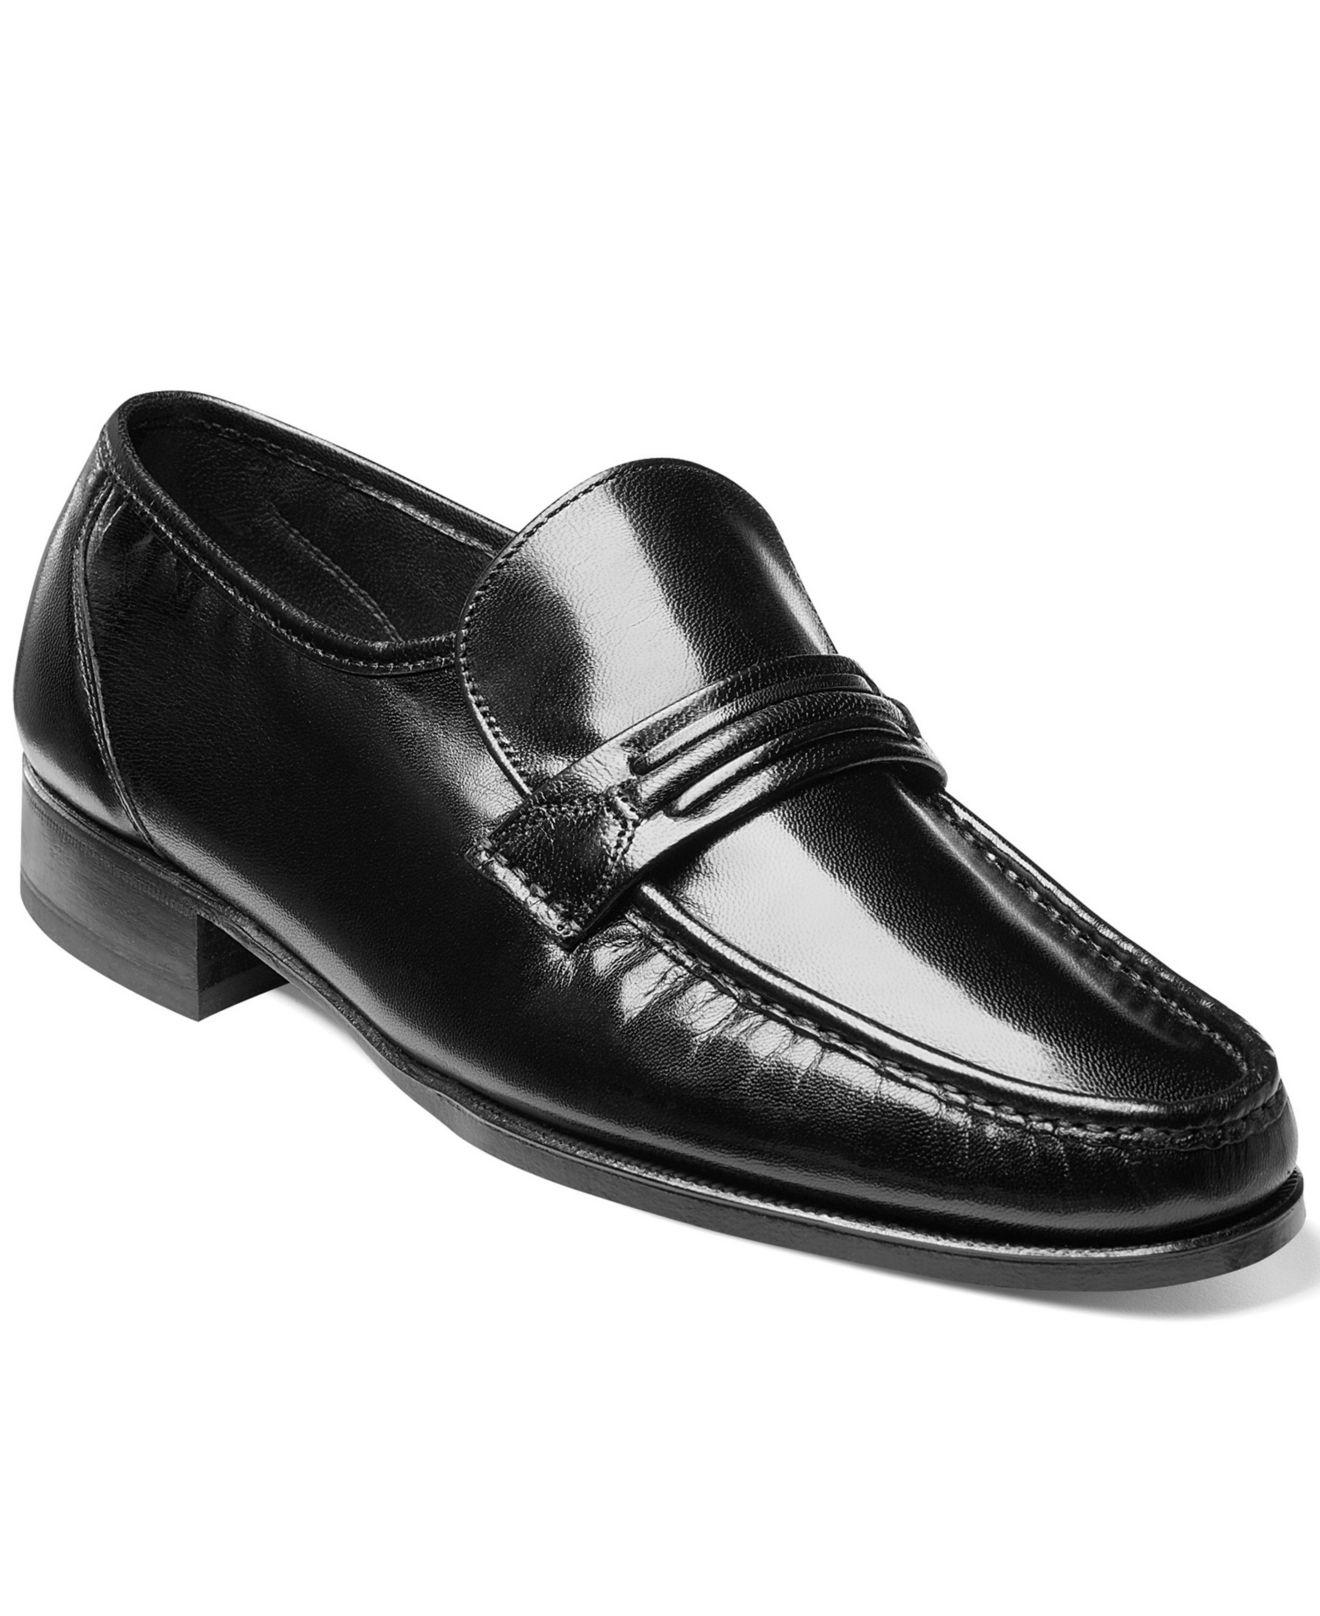 Macy S Florsheim Shoes